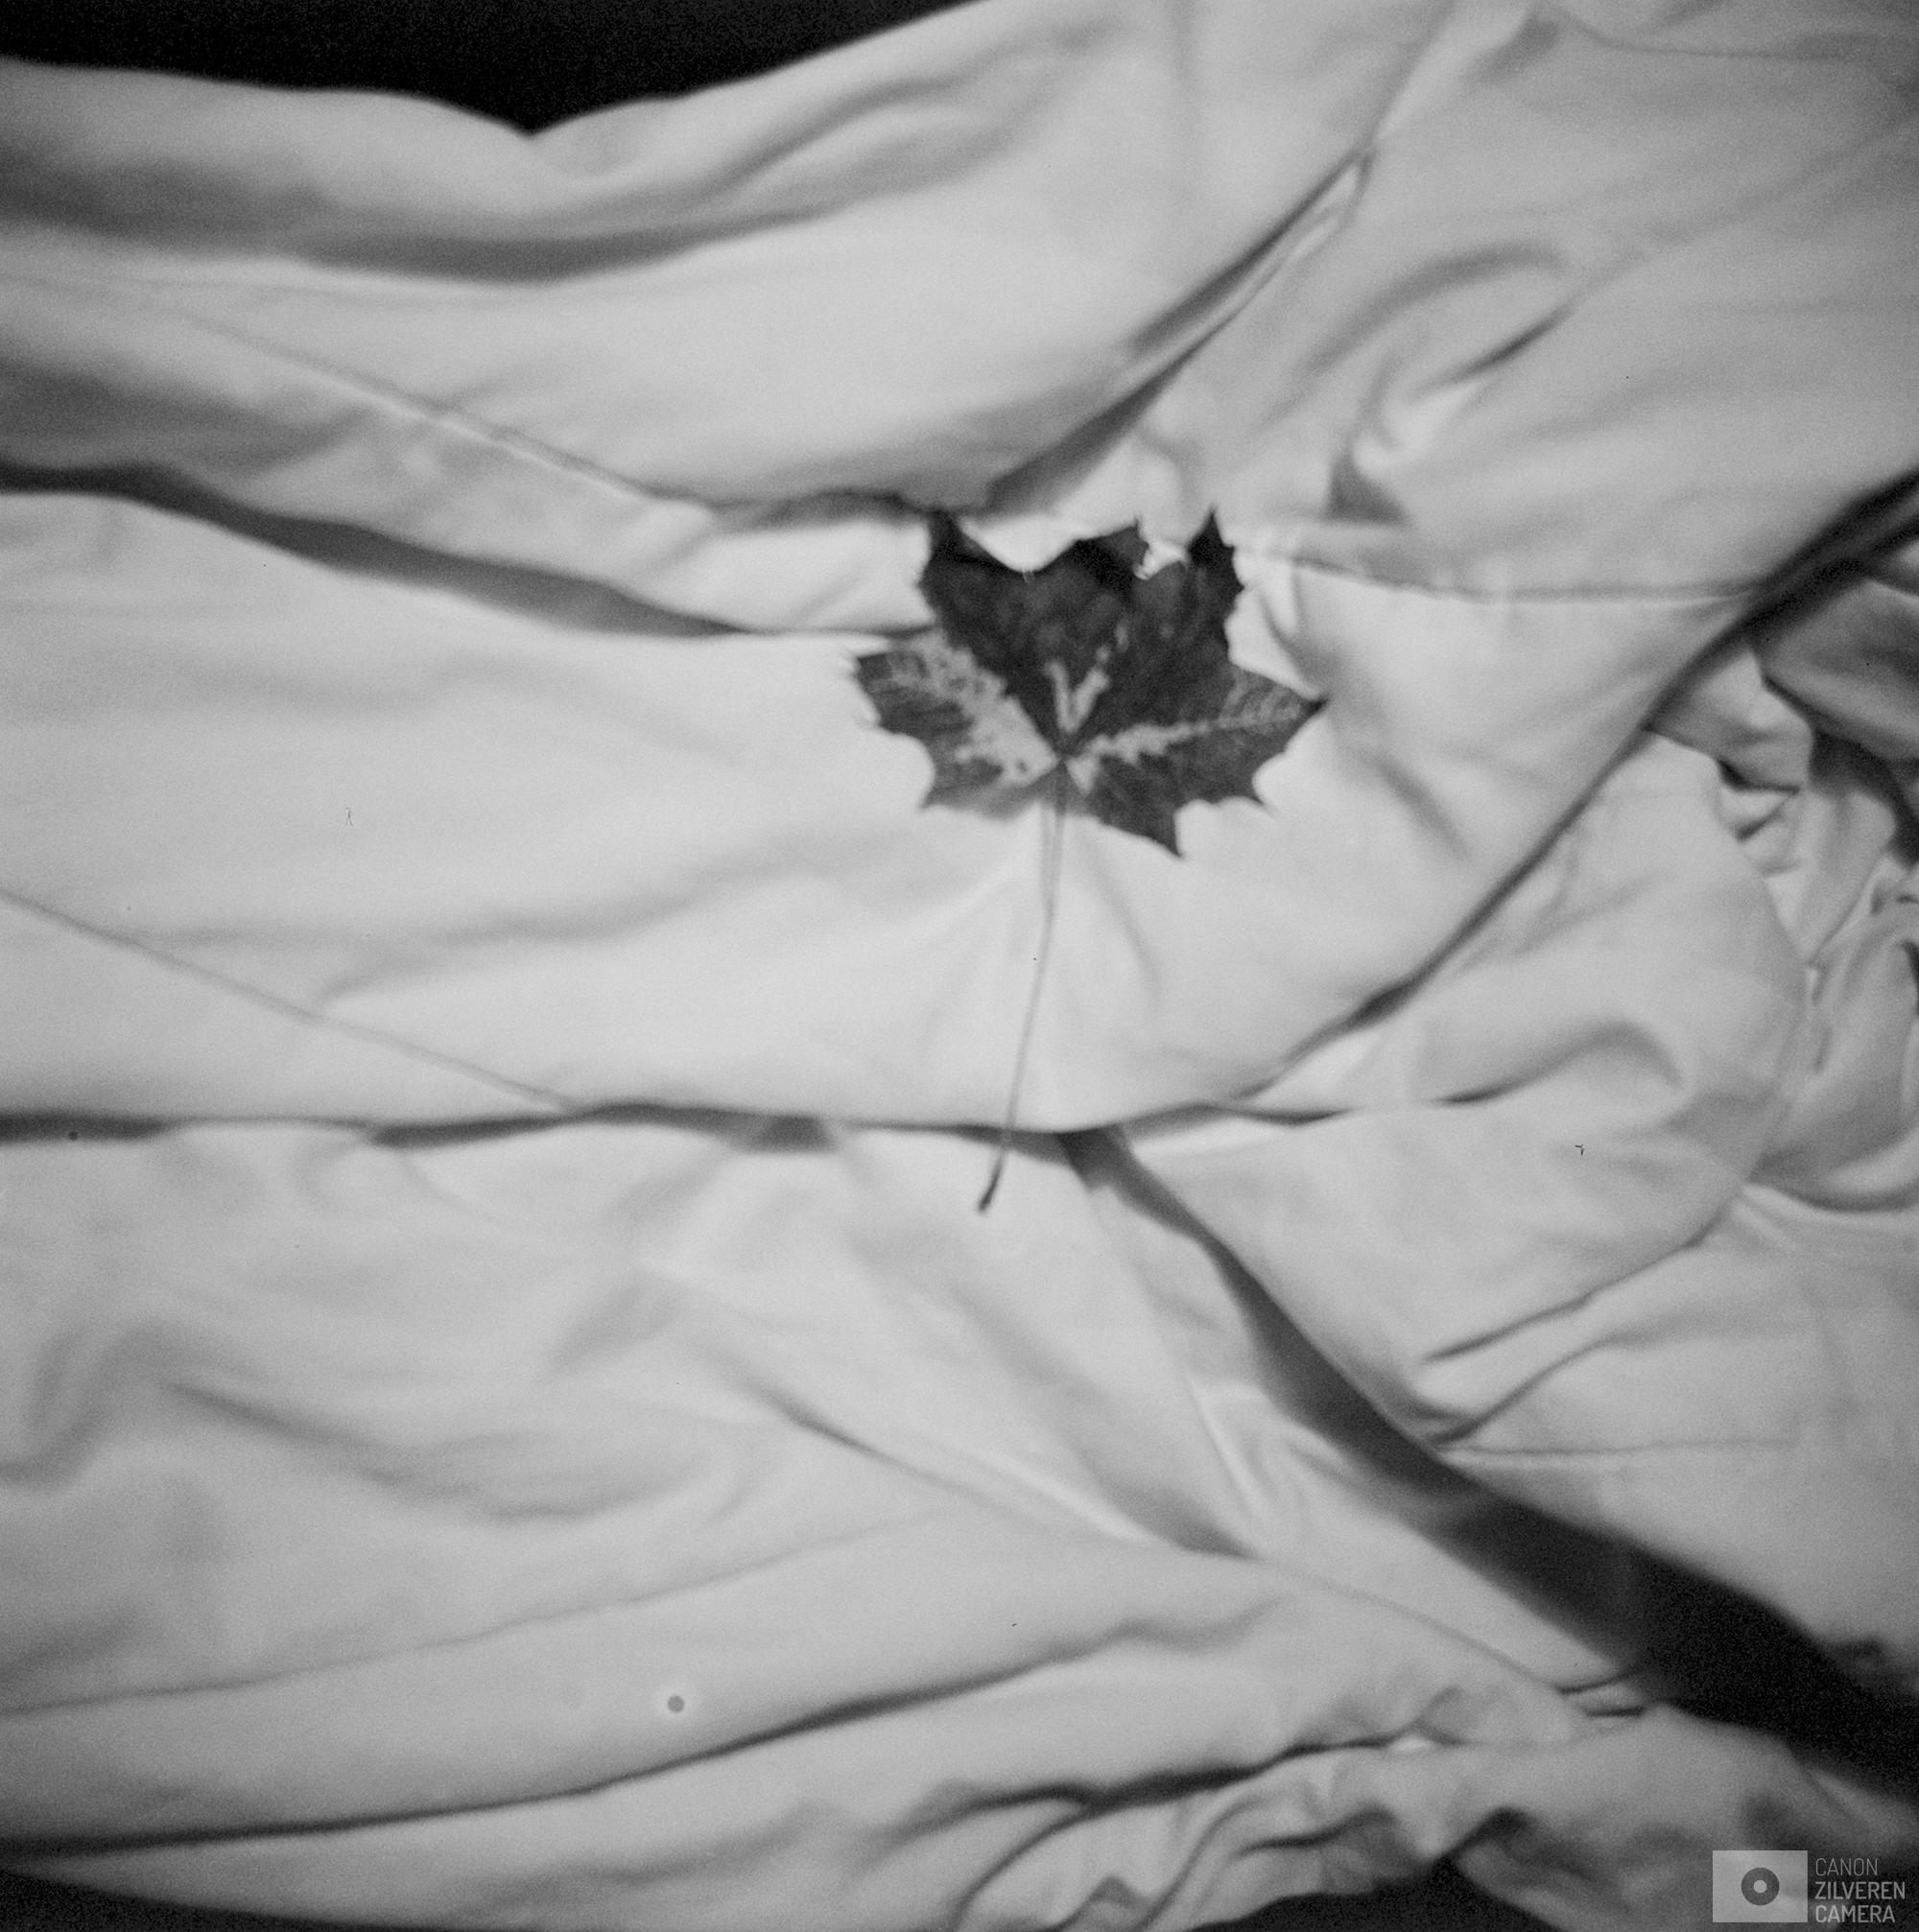 02-2017-documentair-nationaal-vleugellam-582825